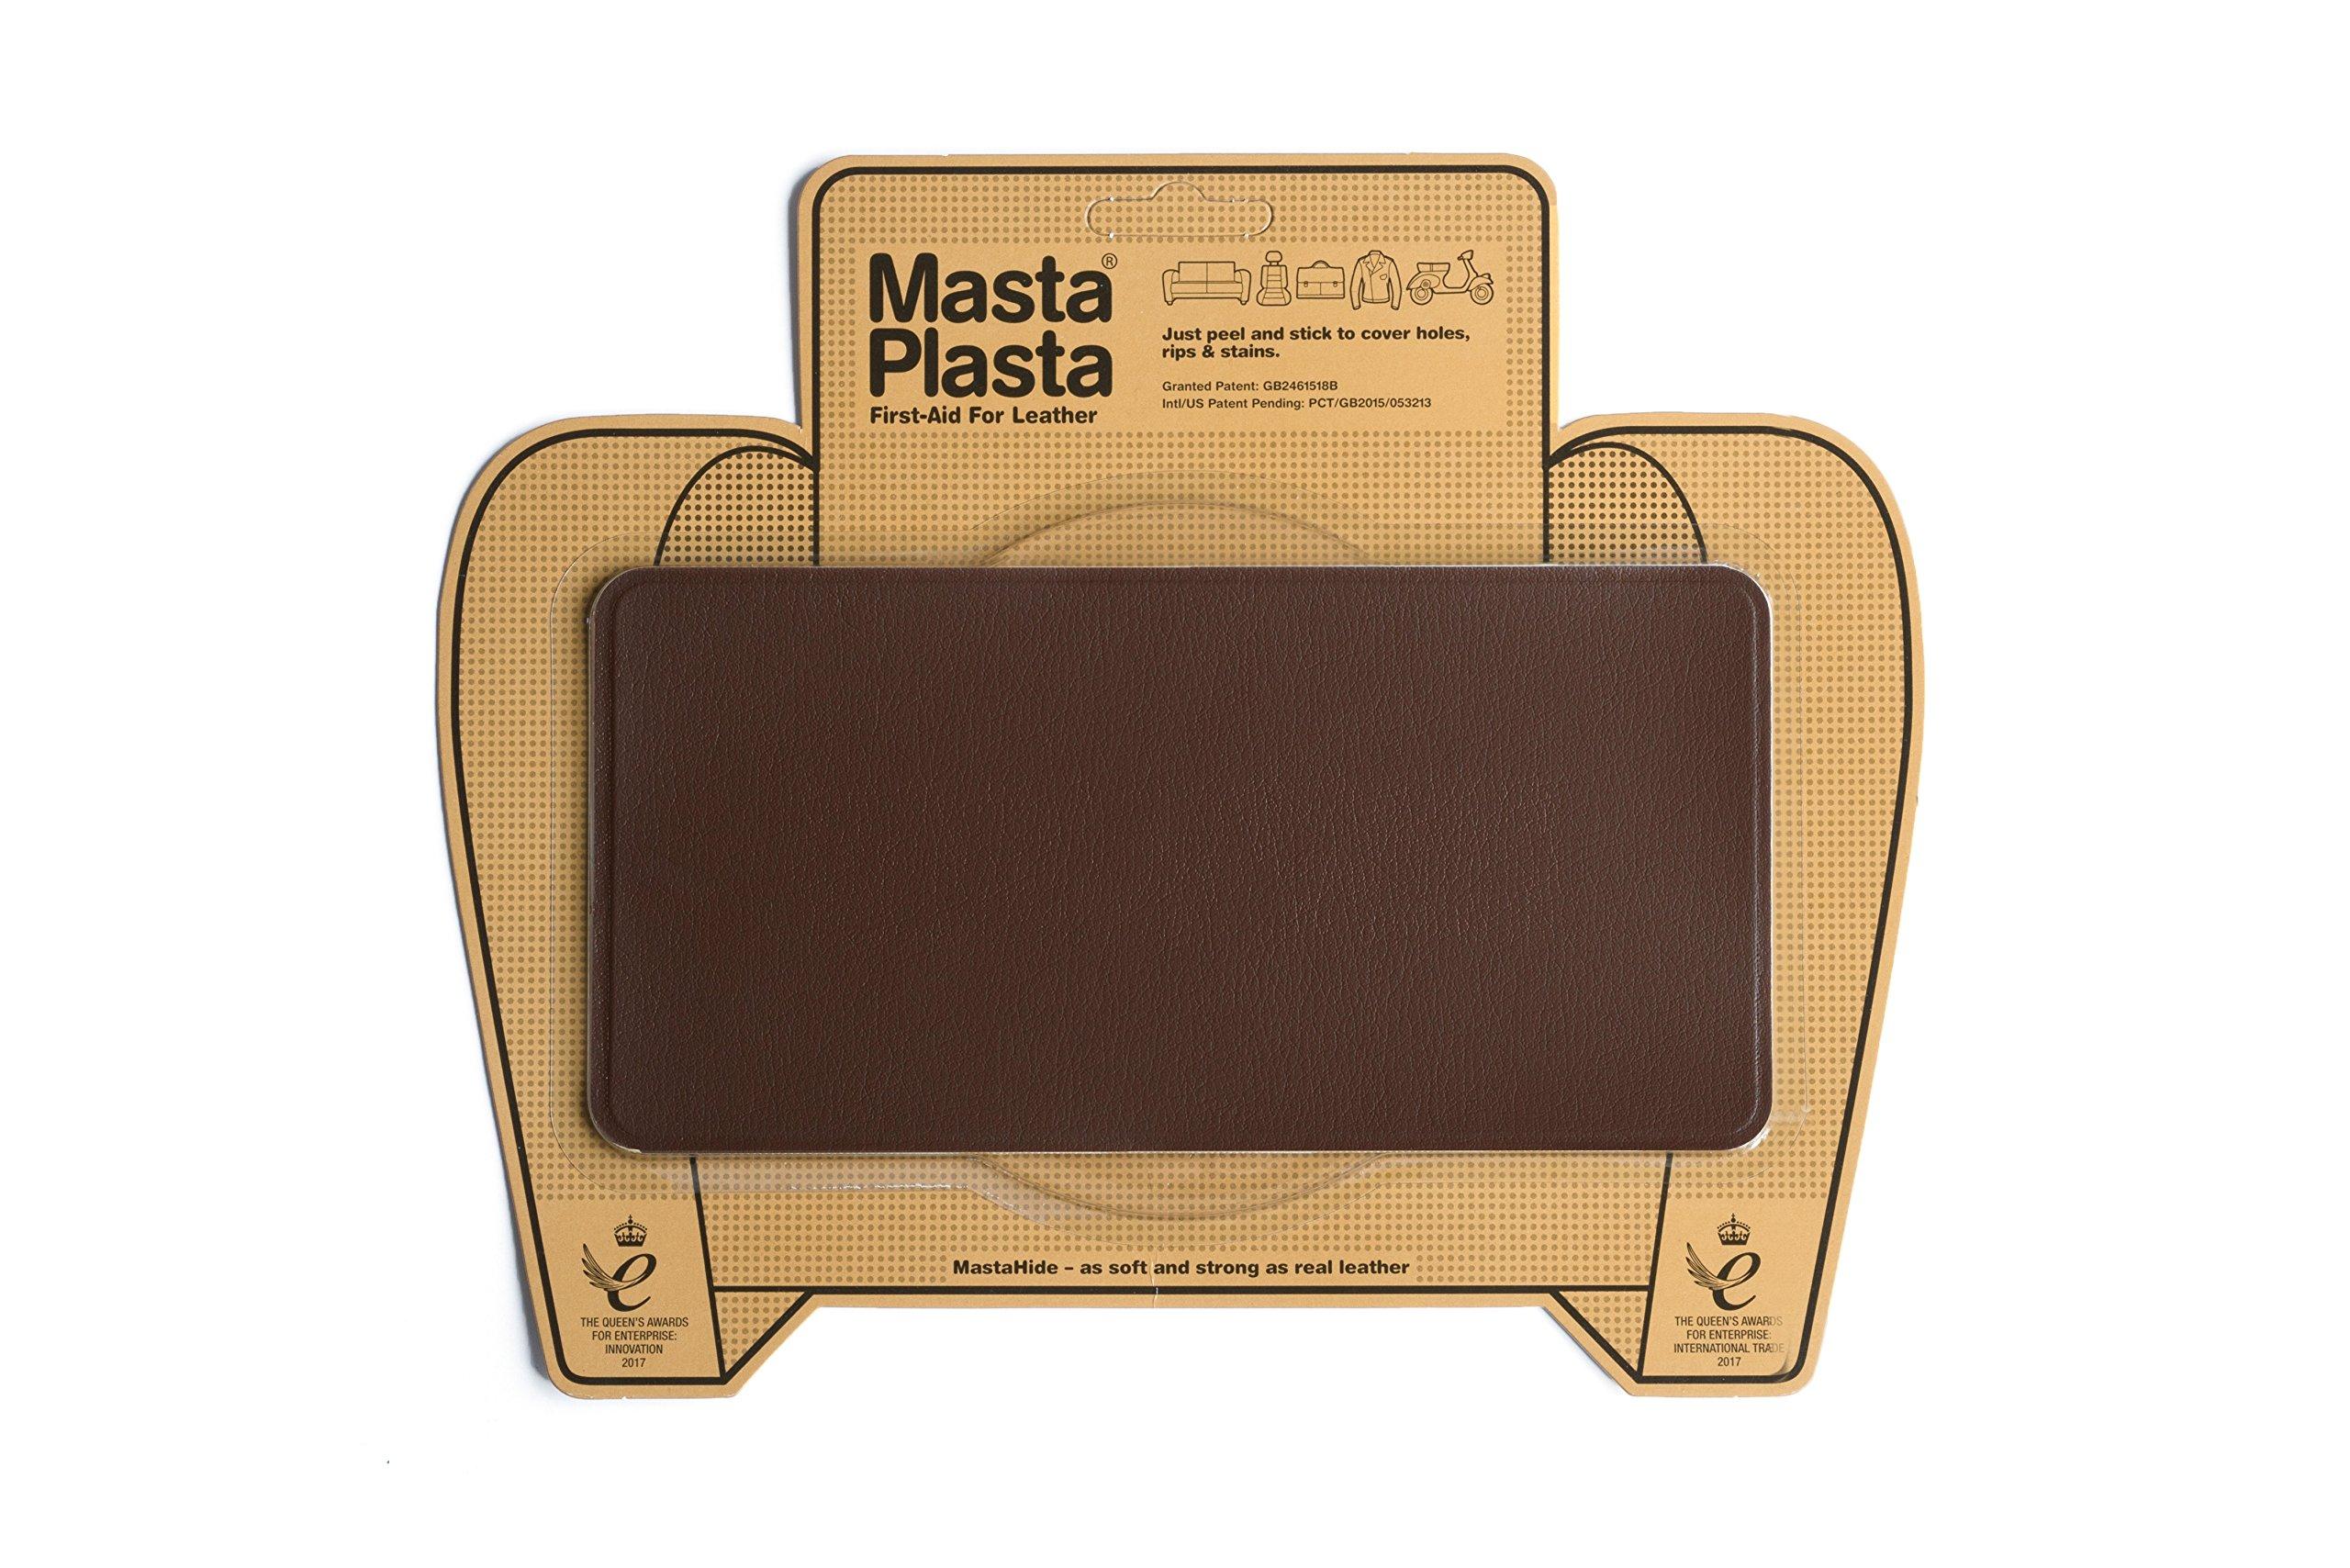 MastaPlasta, Leather Repair Patch, First-Aid for Sofas, Car Seats, Handbags, Jackets, Plain, Mid Brown Medium Stitch 8''x4''